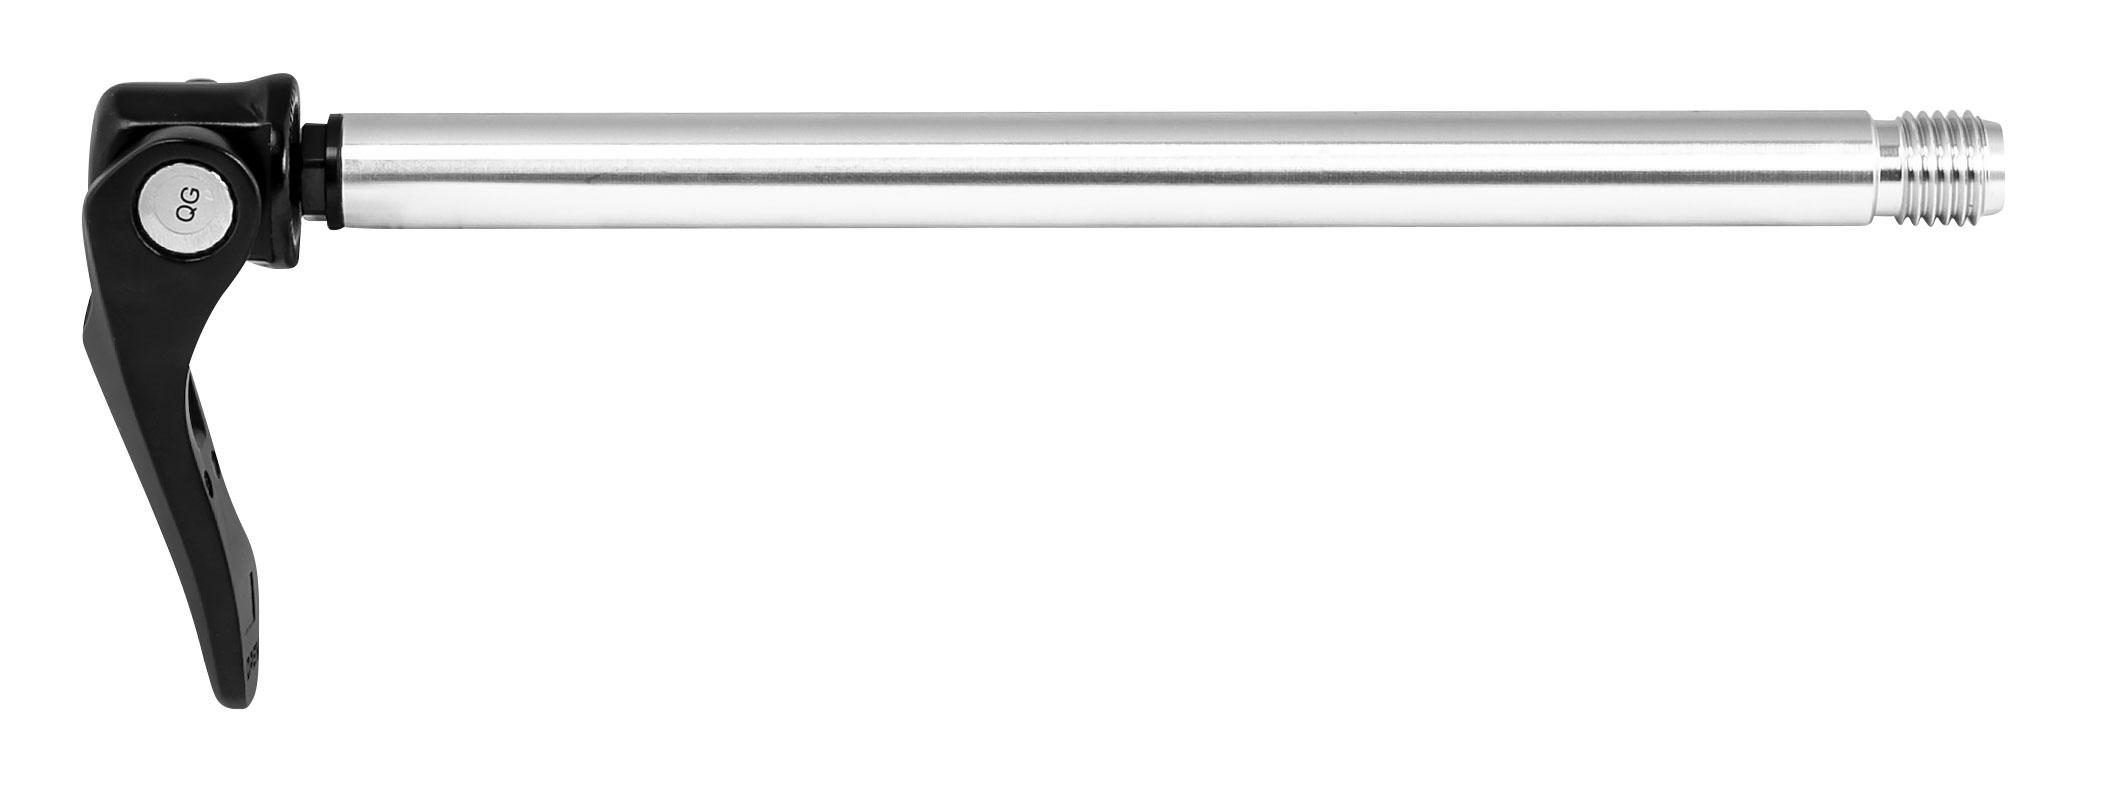 osa zadní SH AXMT500 I-type 142 x 12mm